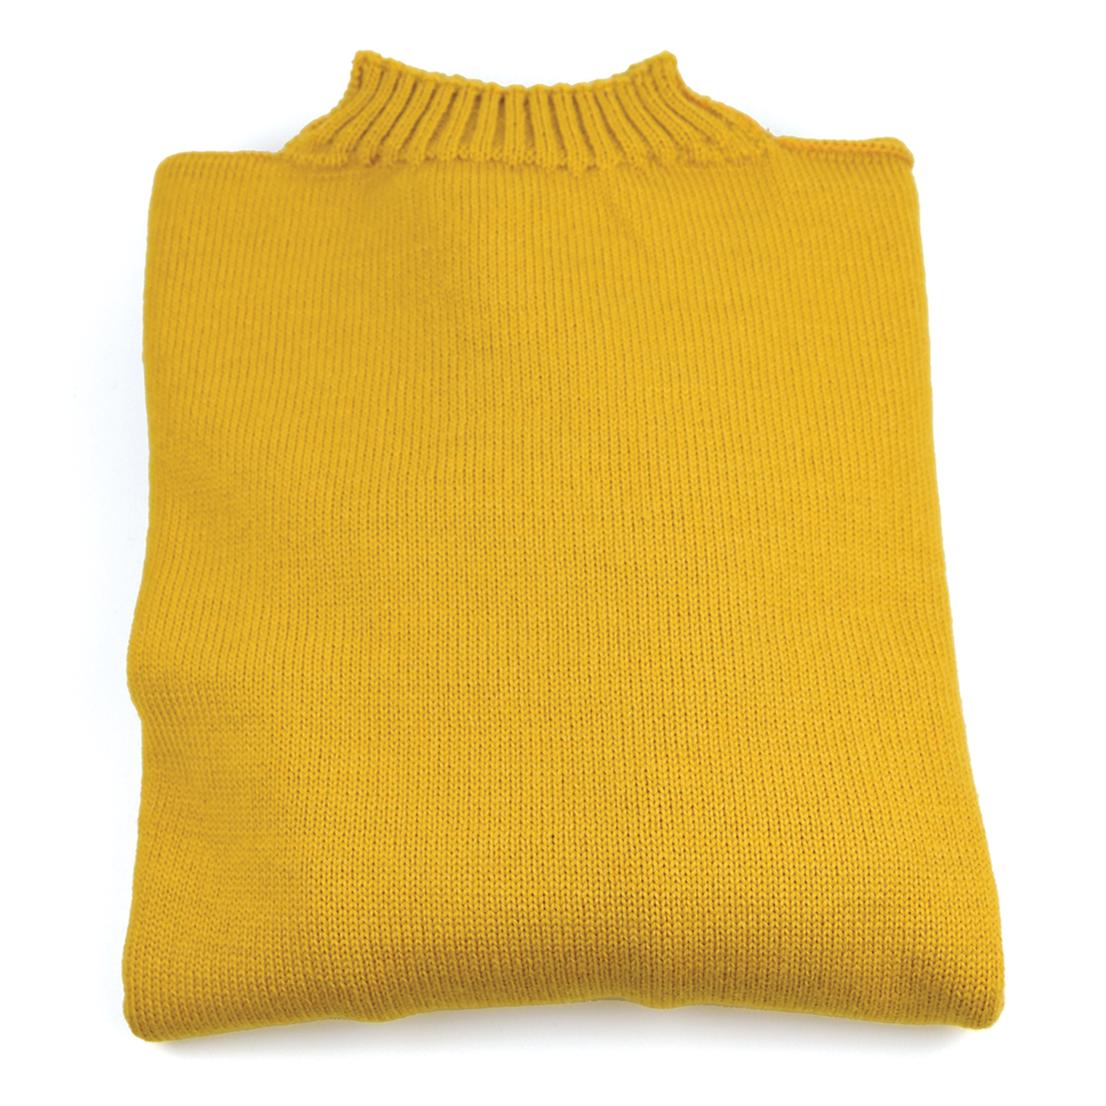 Traditional Wool Guernsey - Mustard